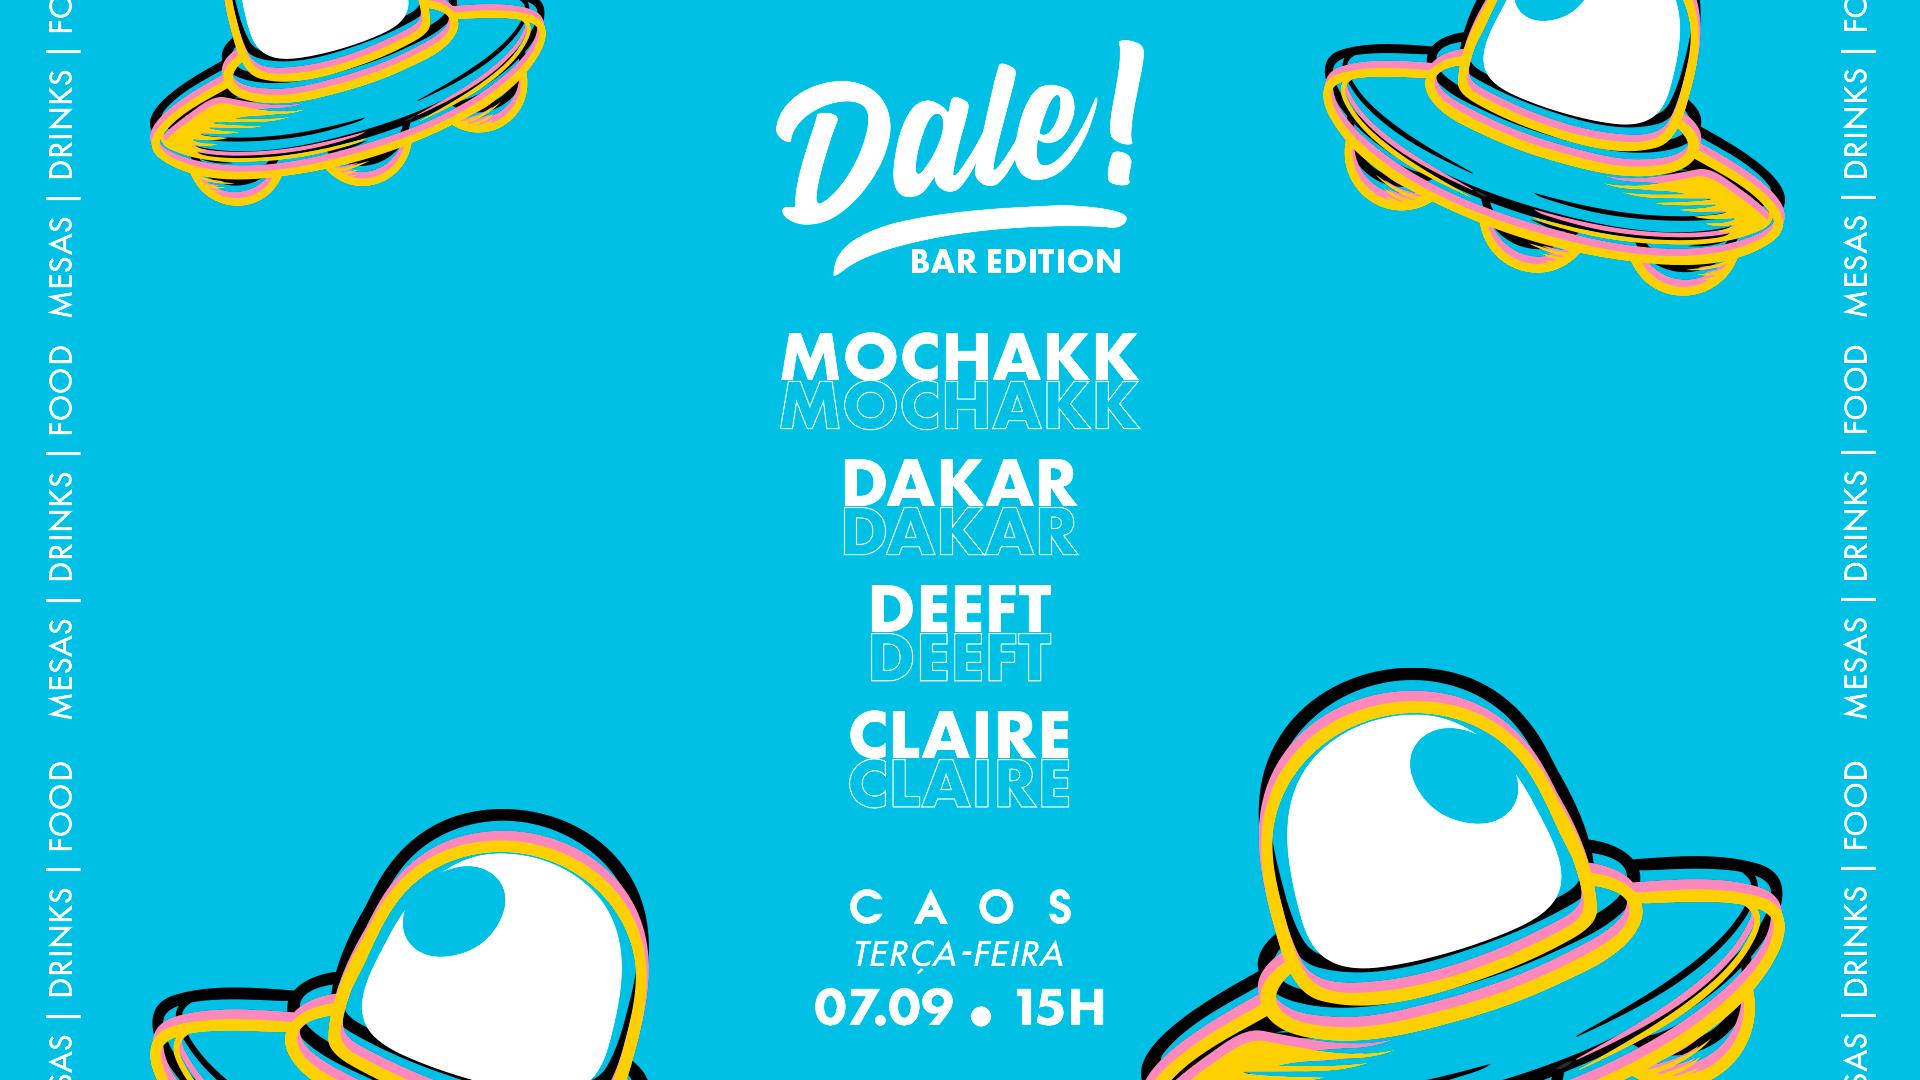 Dale! apresenta Mochakk, Dakar e Deeft.